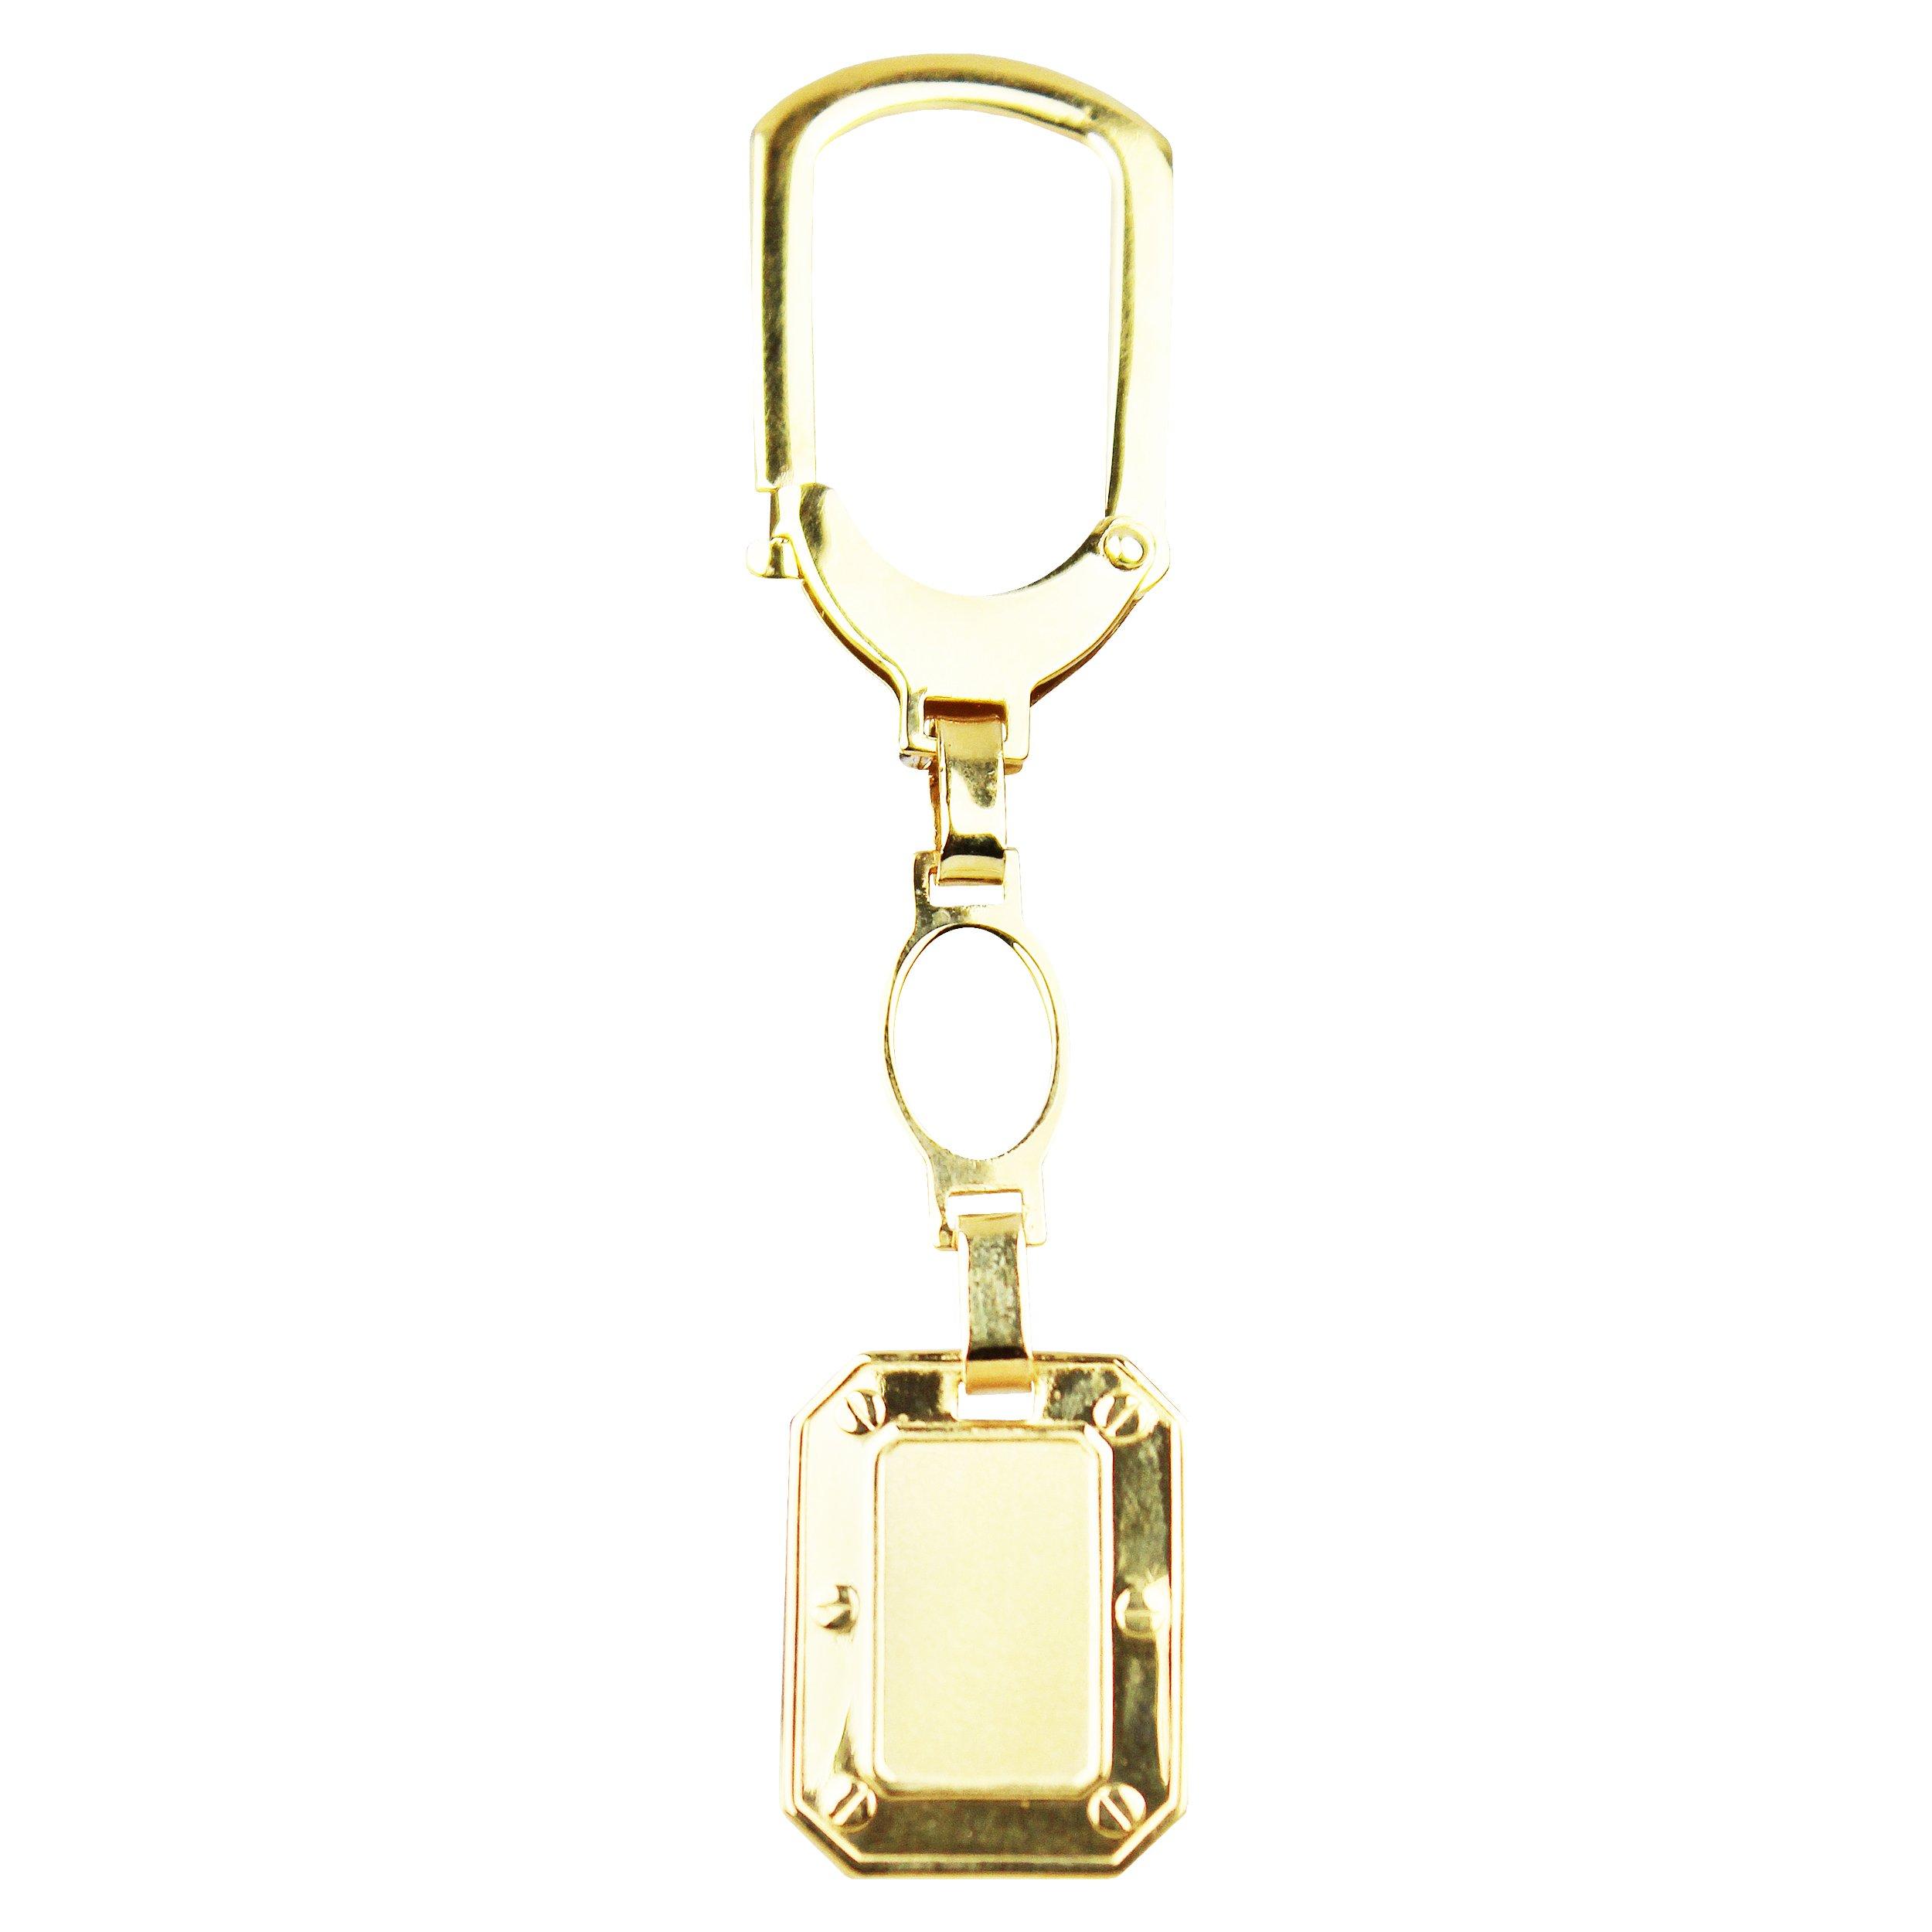 14k Yellow Gold Octagon Key Chain